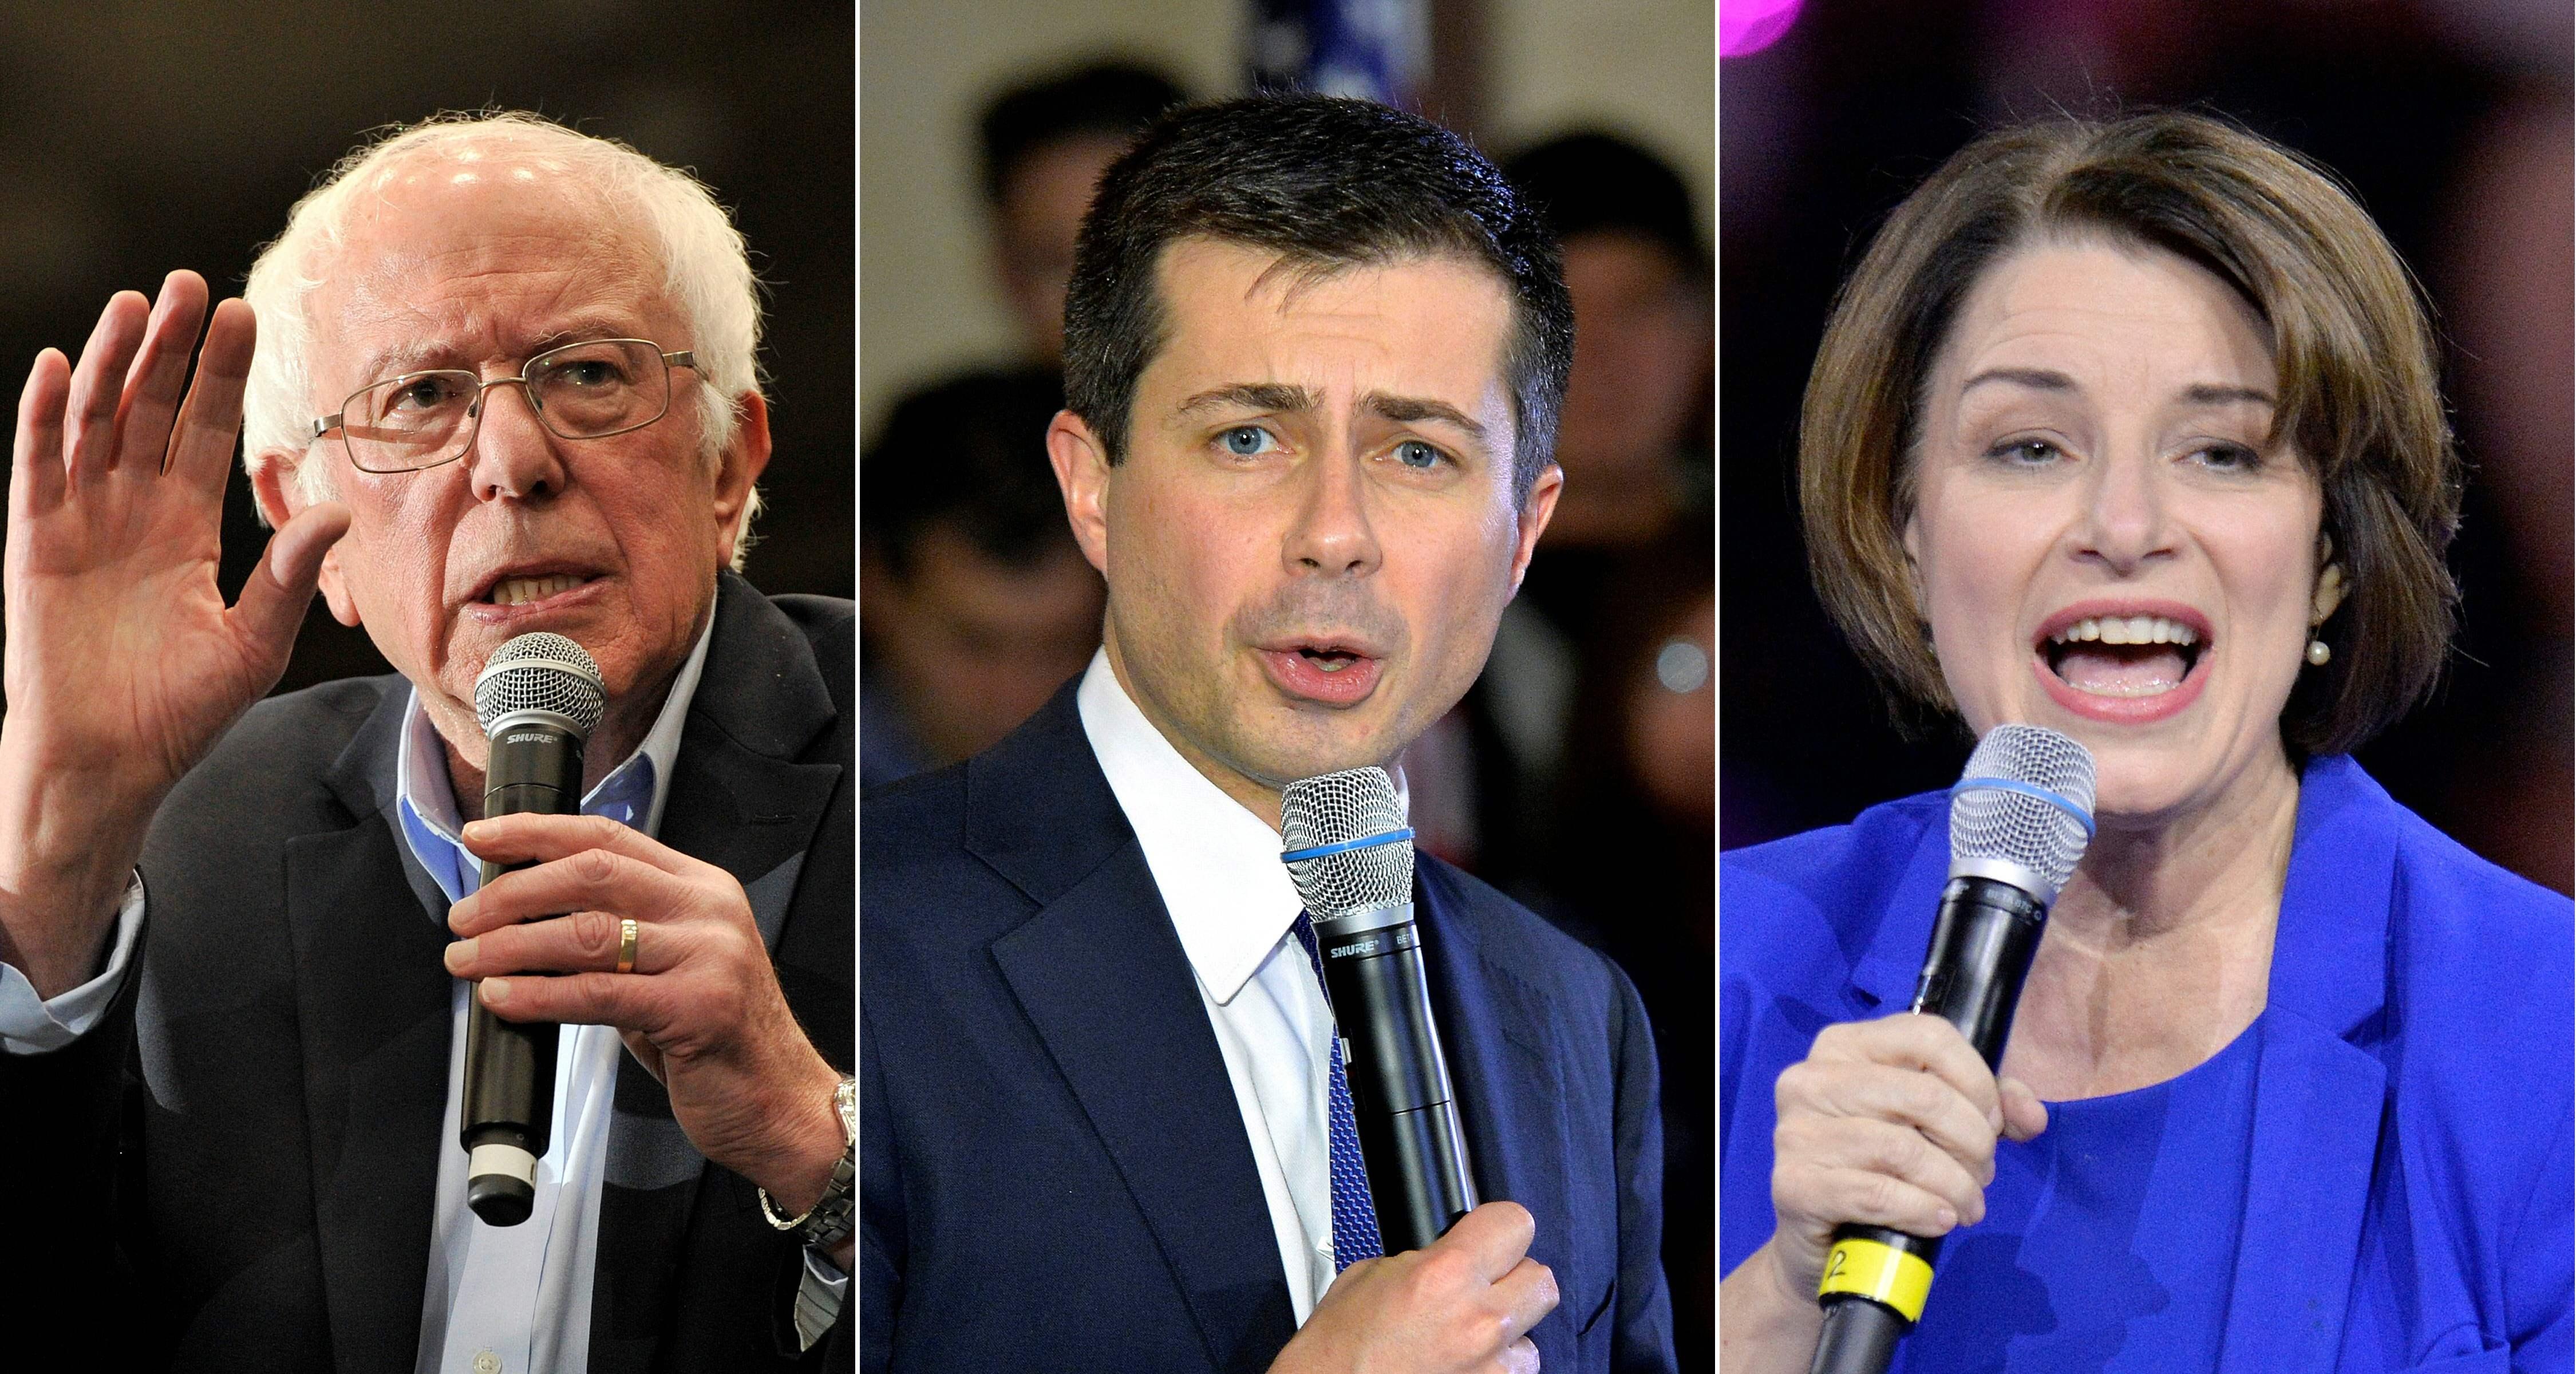 No fatalism allowed: Democrats can beat Trump with a progressive-centrist unity ticket